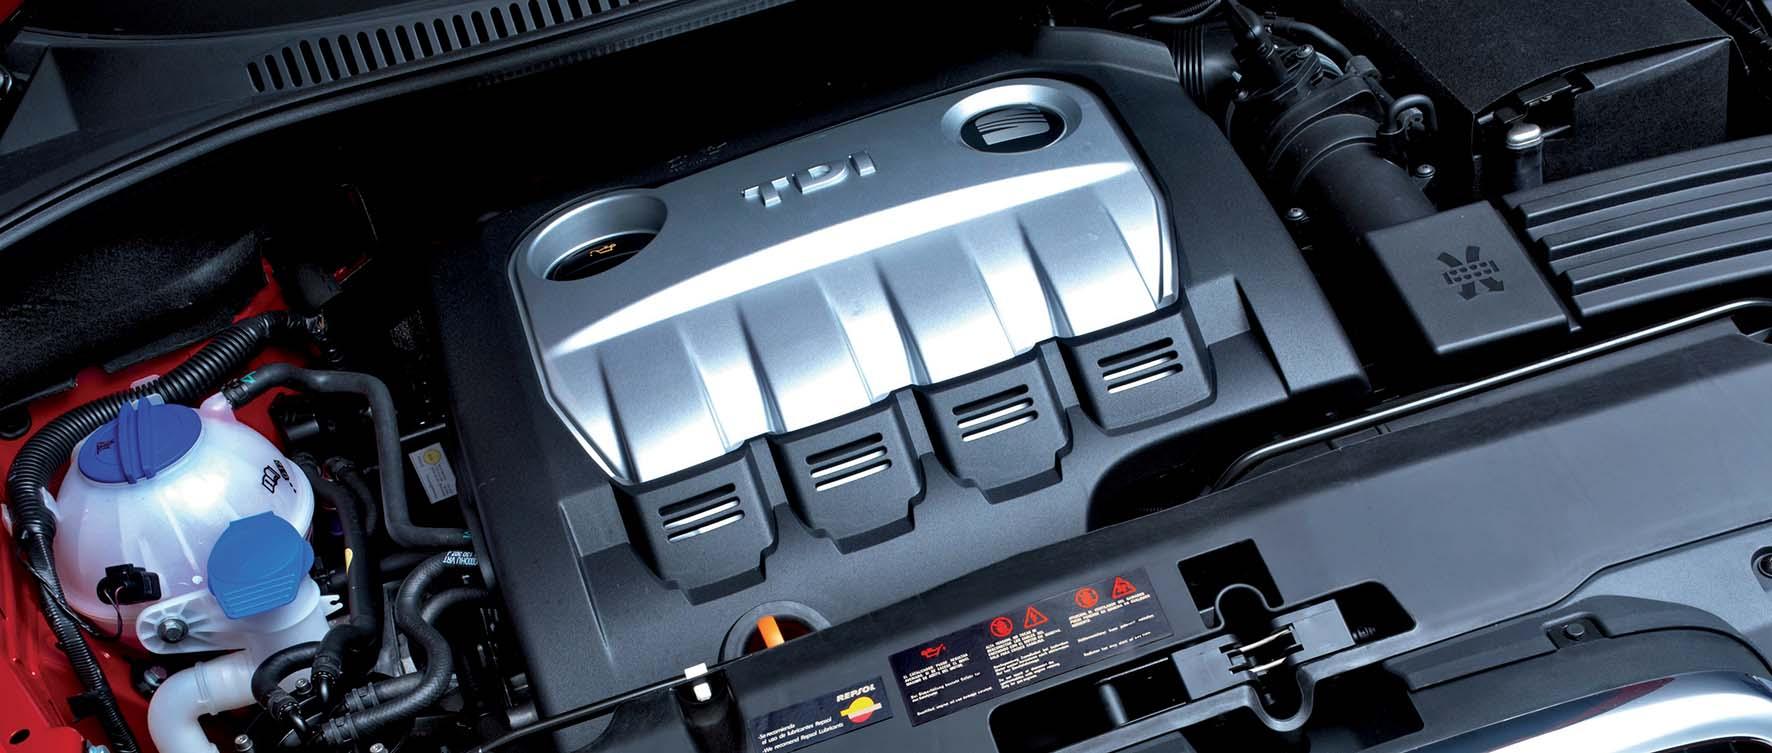 Seat 2005 Altea FR TDI 2.0 170Cv vano motore